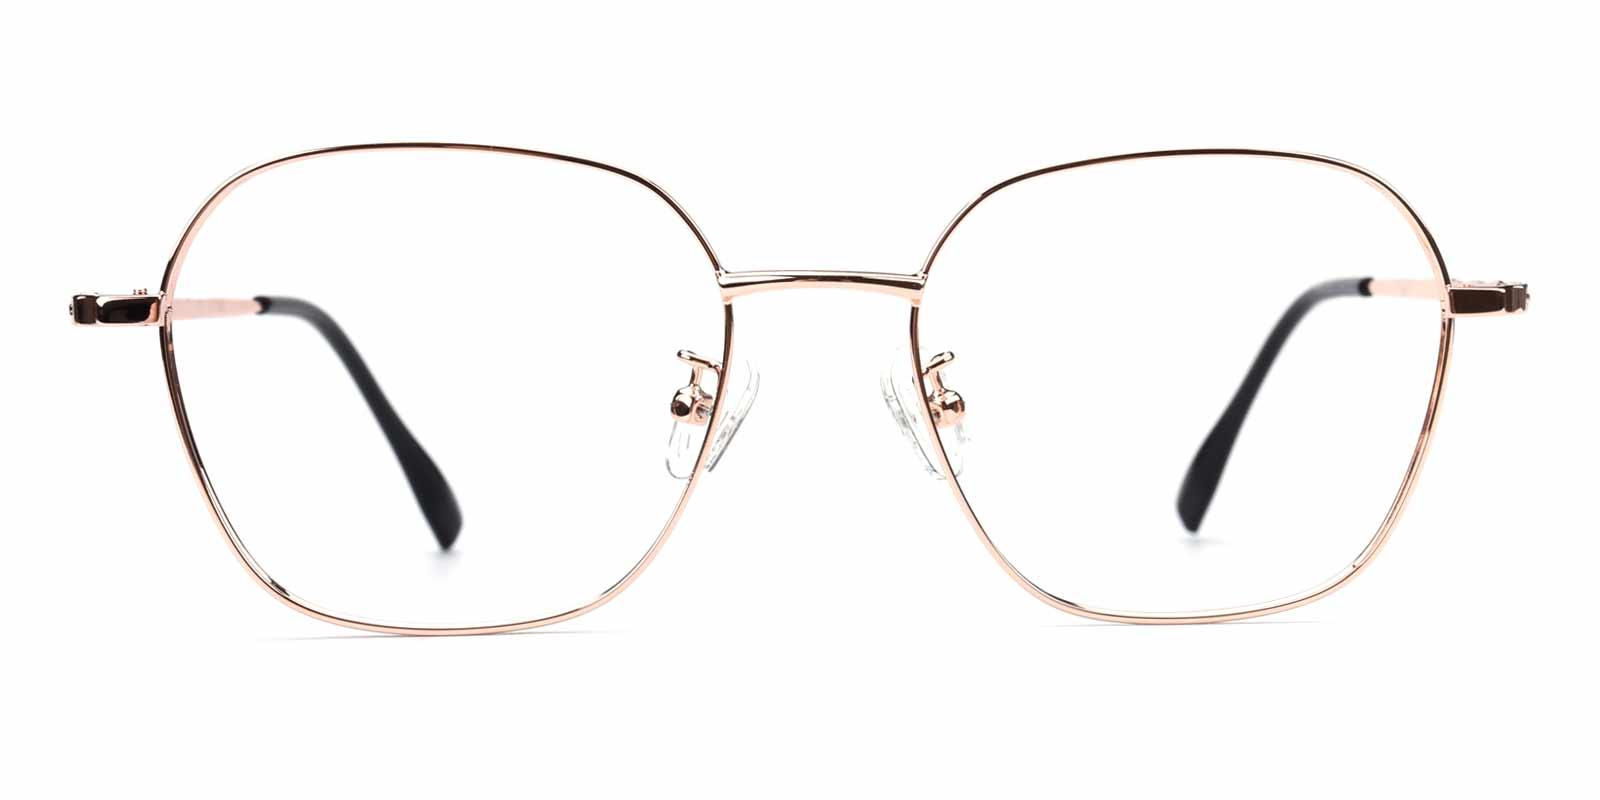 Aidan-Gold-Square-Metal-Eyeglasses-additional2